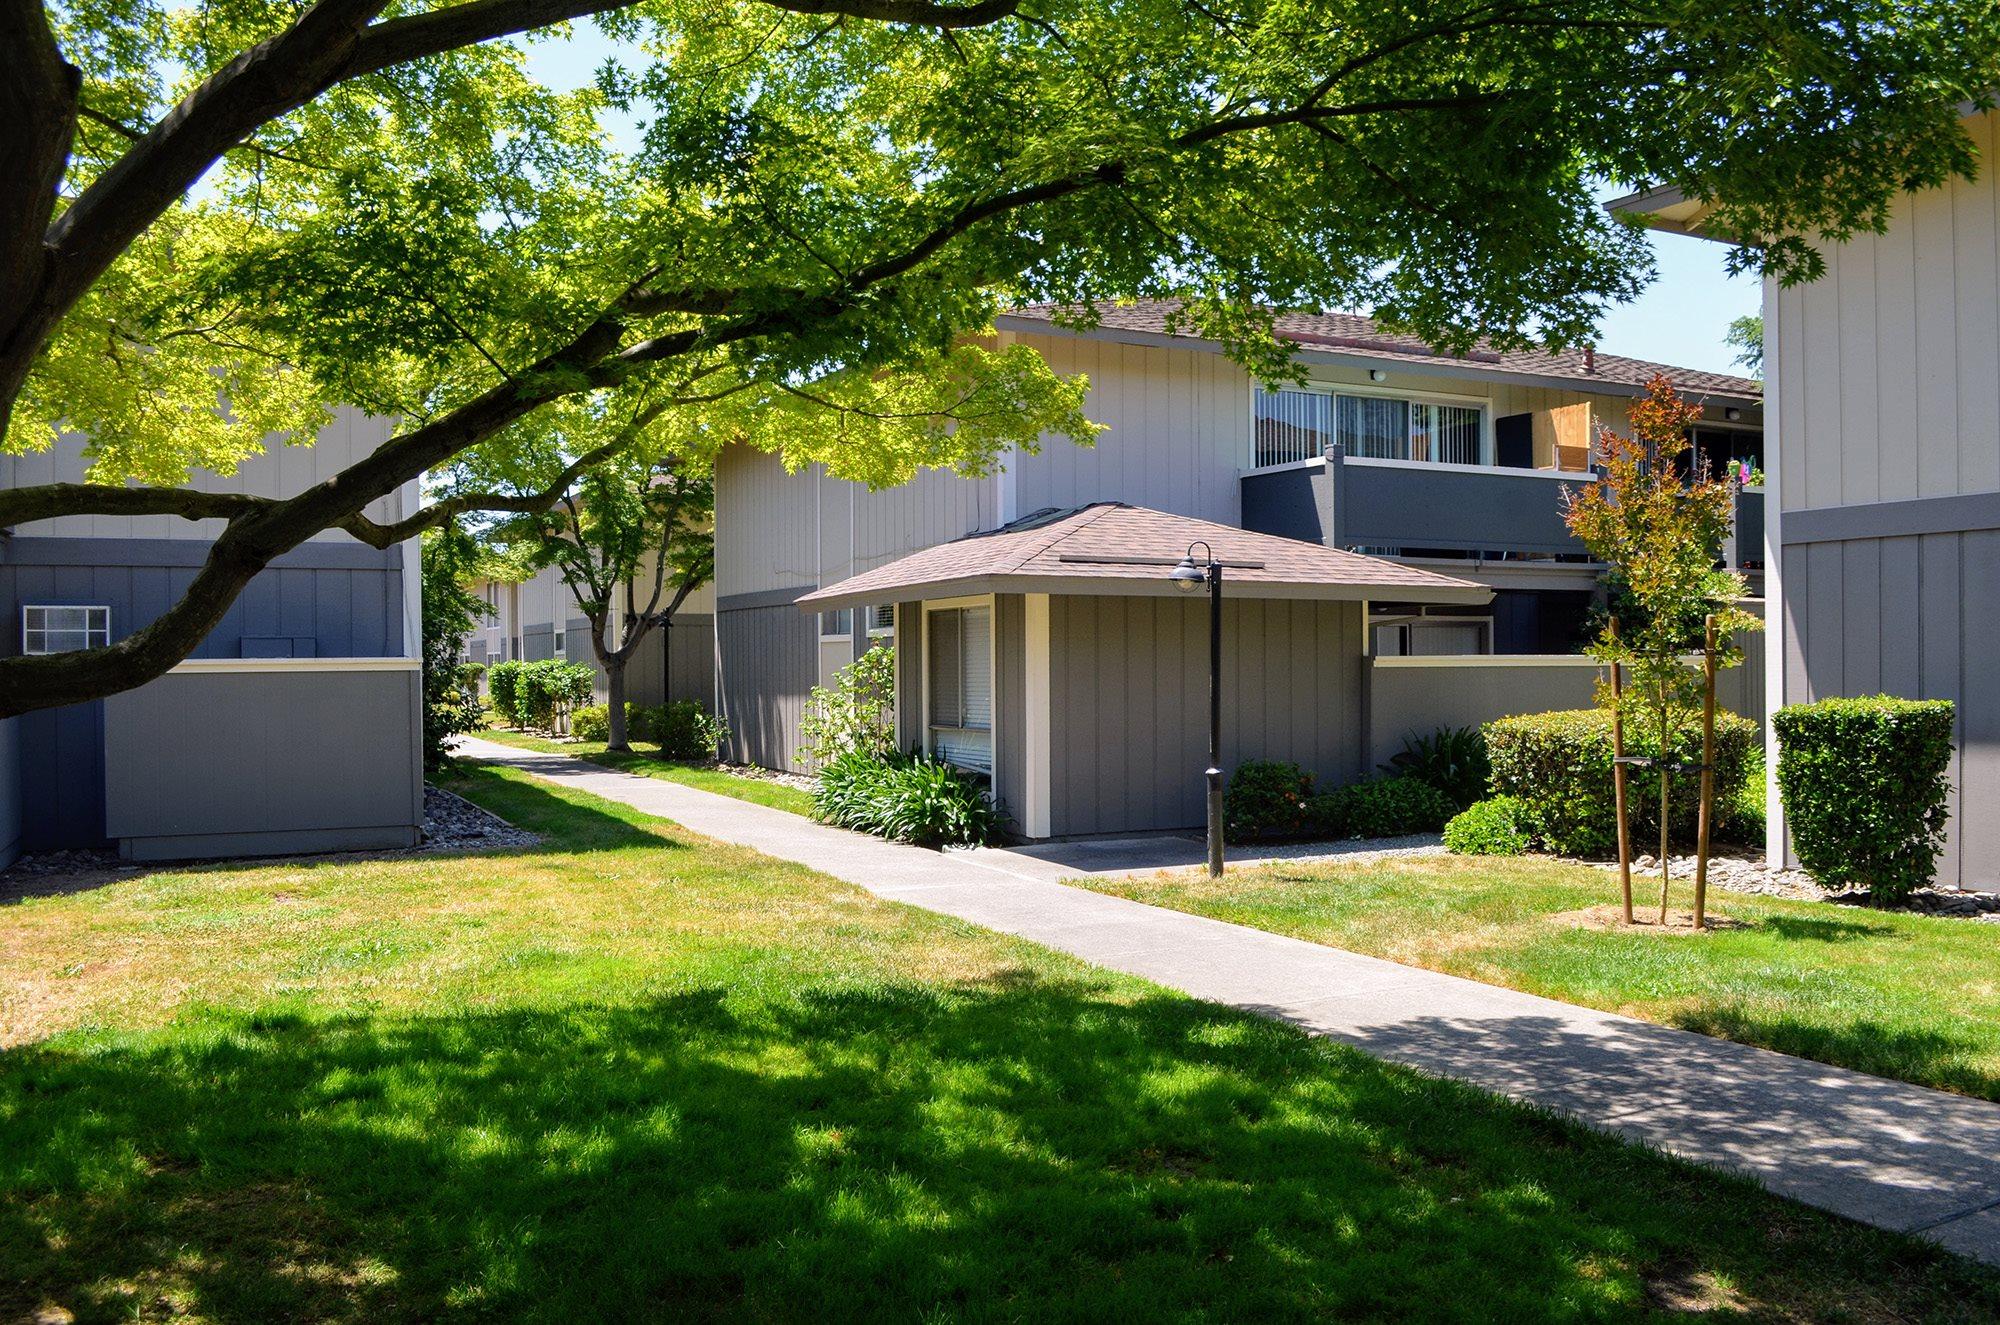 Amazing Outdoor Spaces at Bella Vista Apartment Homes, Napa, California